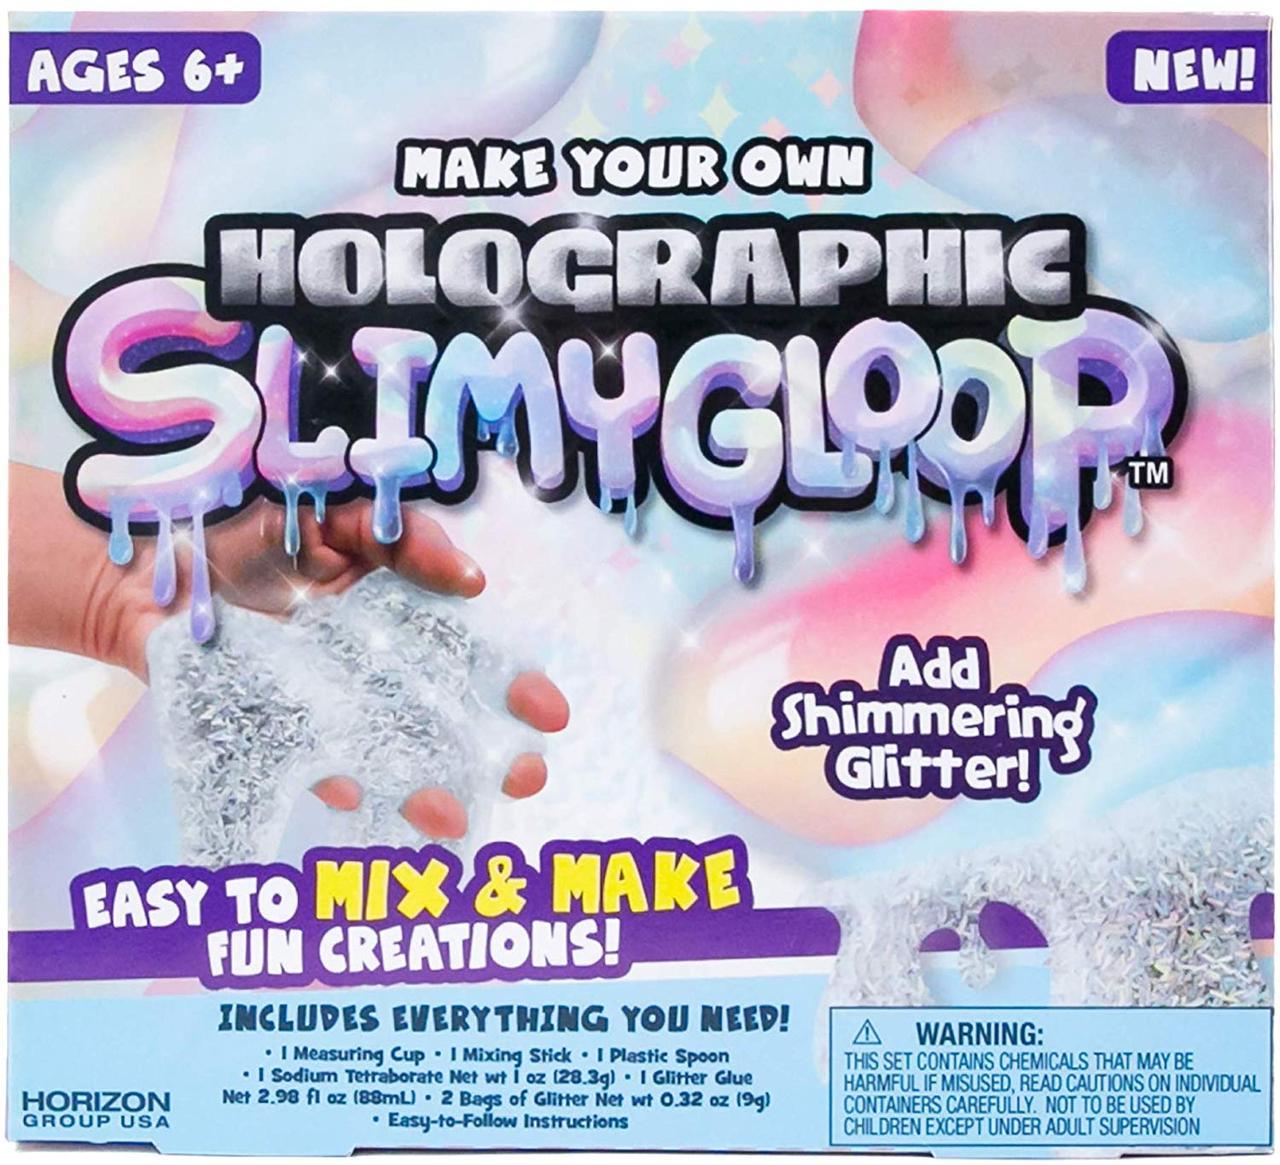 "Набор для создания блестящего слайма ""Серебро"" Slimygloop Slime Kit, Horizon Group, оригинал из США"